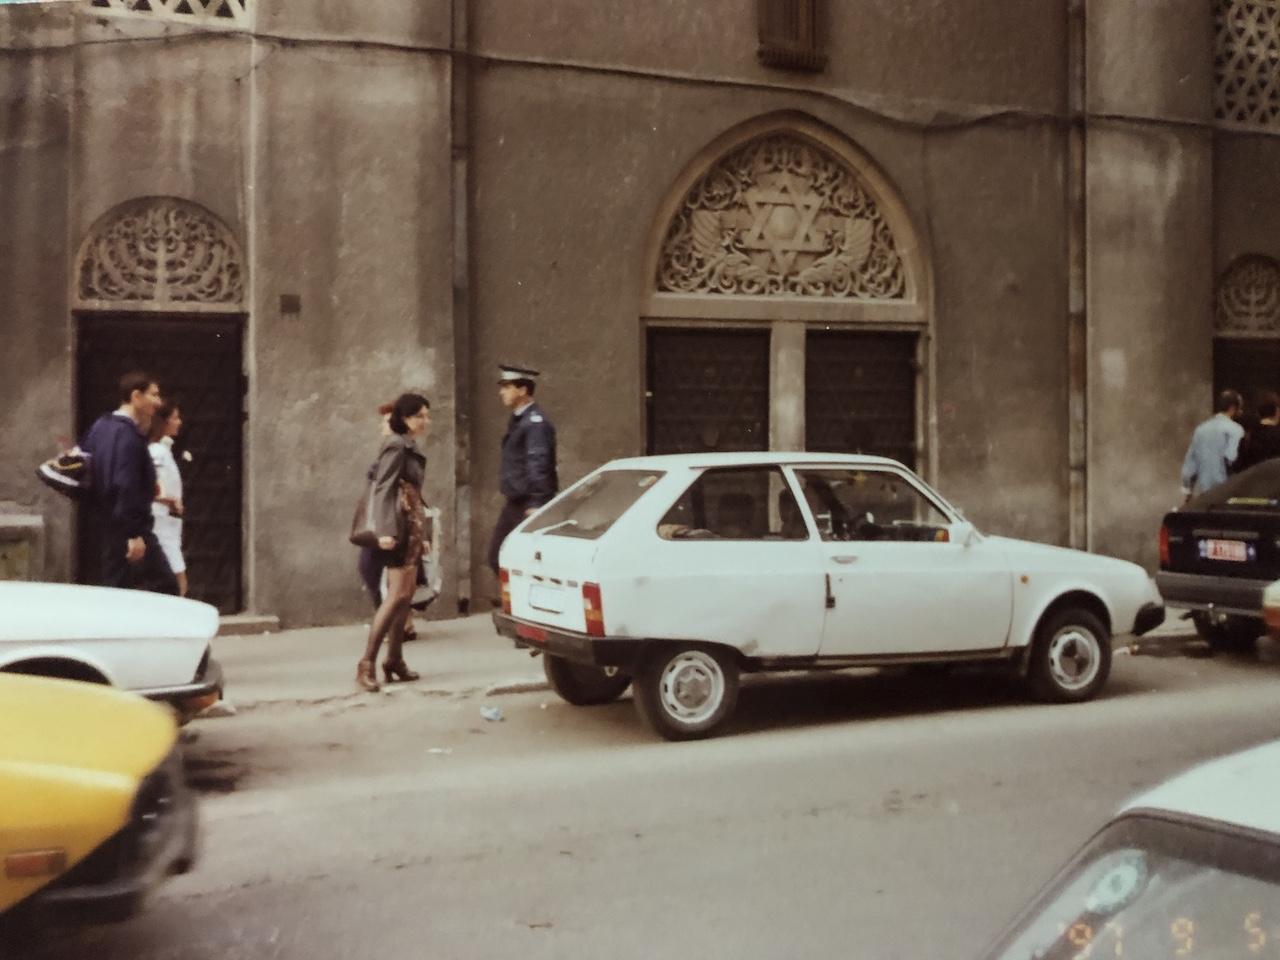 Langa Sinagoga Amzei, din Strada Tache Ionesc, 5 septembrie 1997. Aici aveam parul saten inchis. jpeg